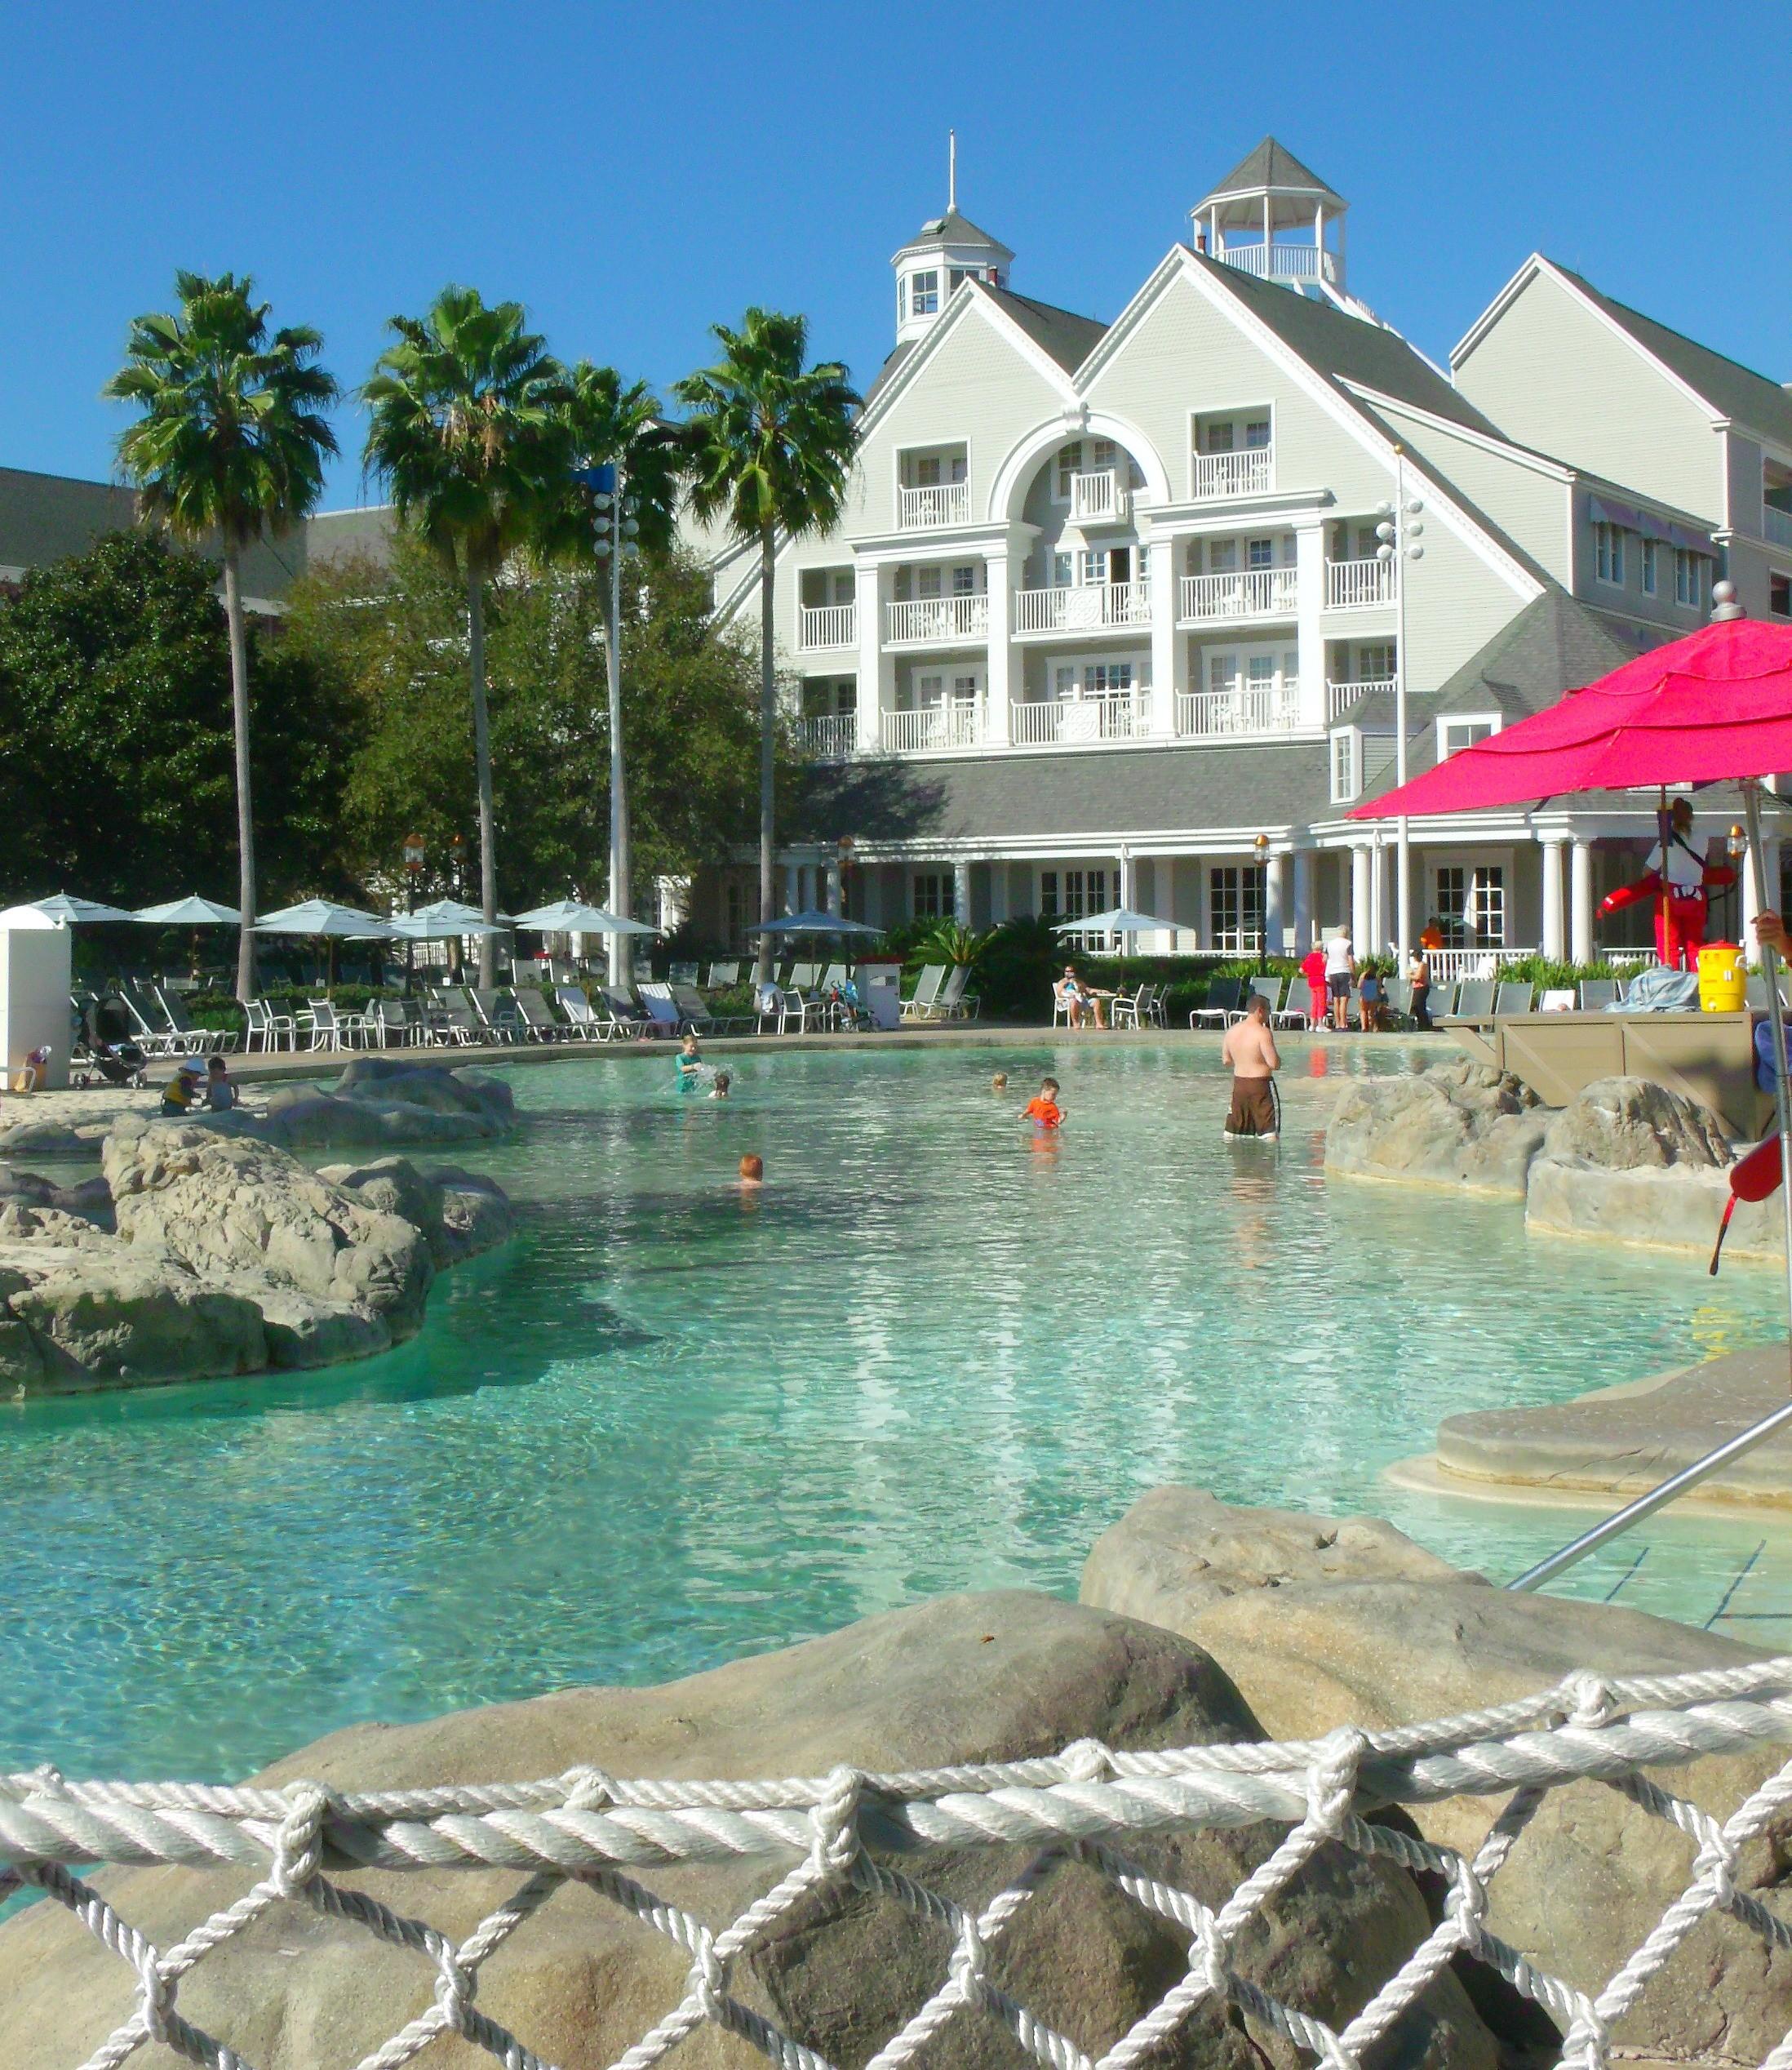 Disney's Beach Club Villas and pool